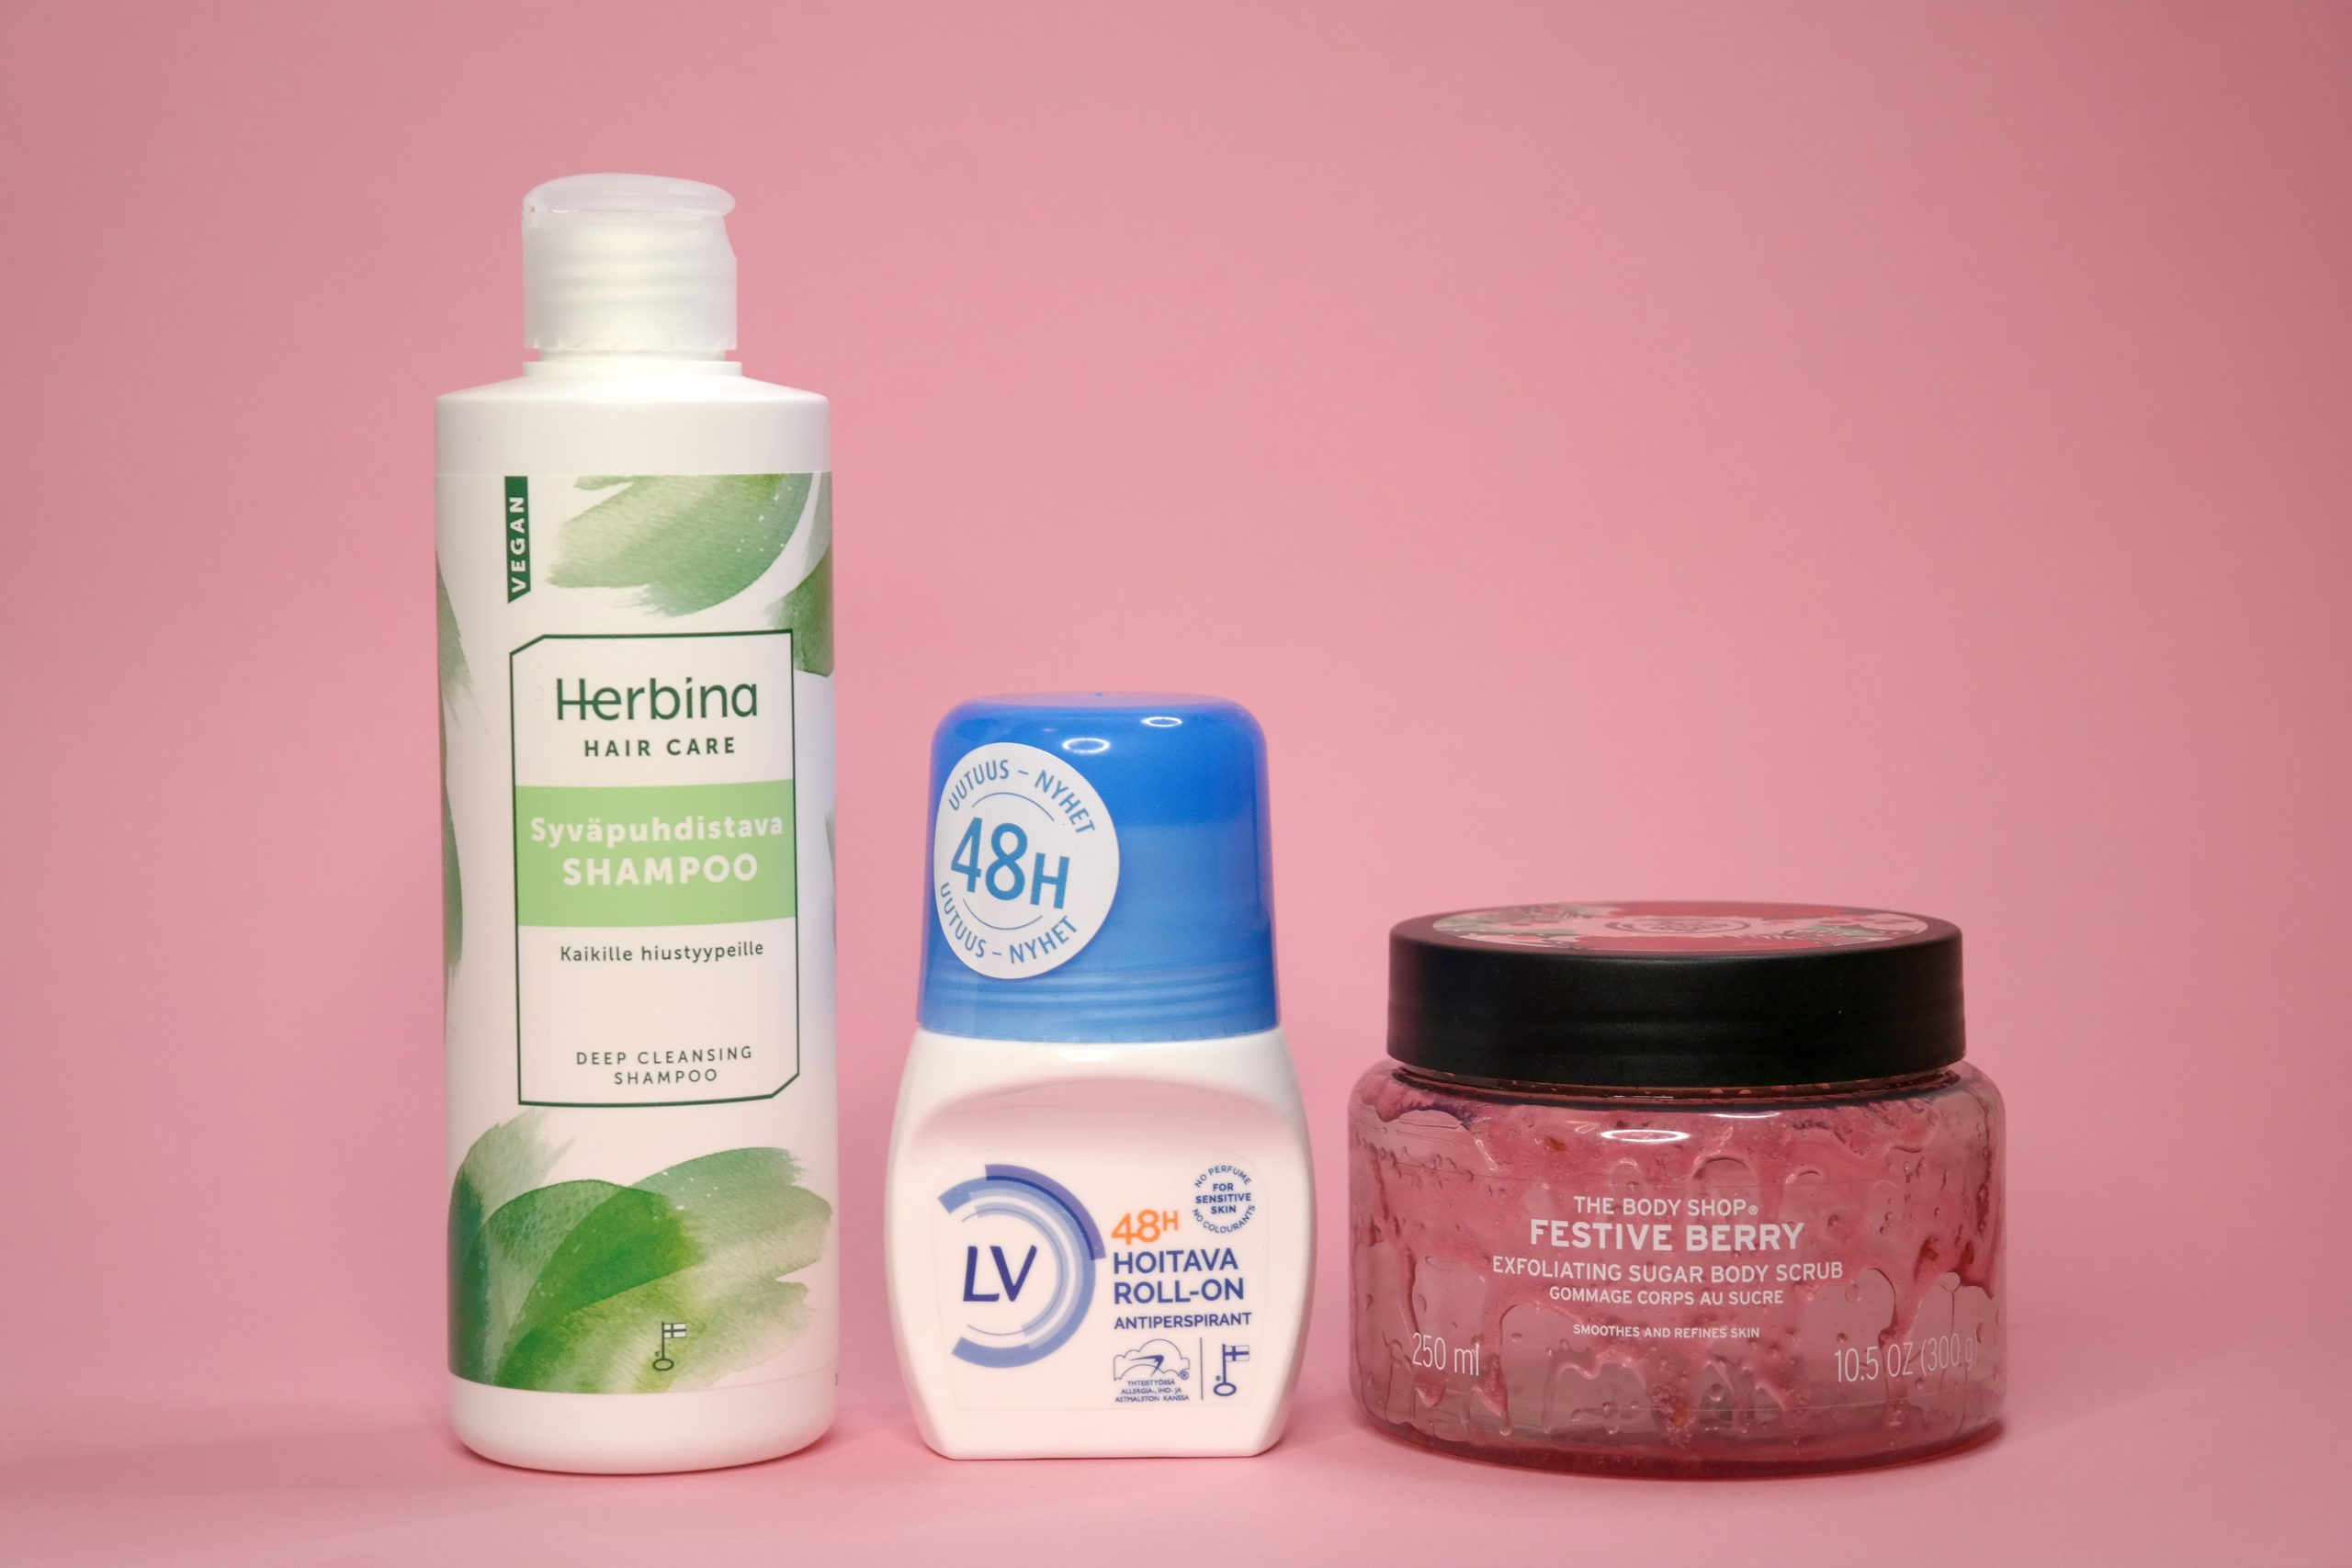 Herbina syväpuhdistava shampoo, LV hoitava antipersirantti, The Body Shop Festive Berry kuorinta